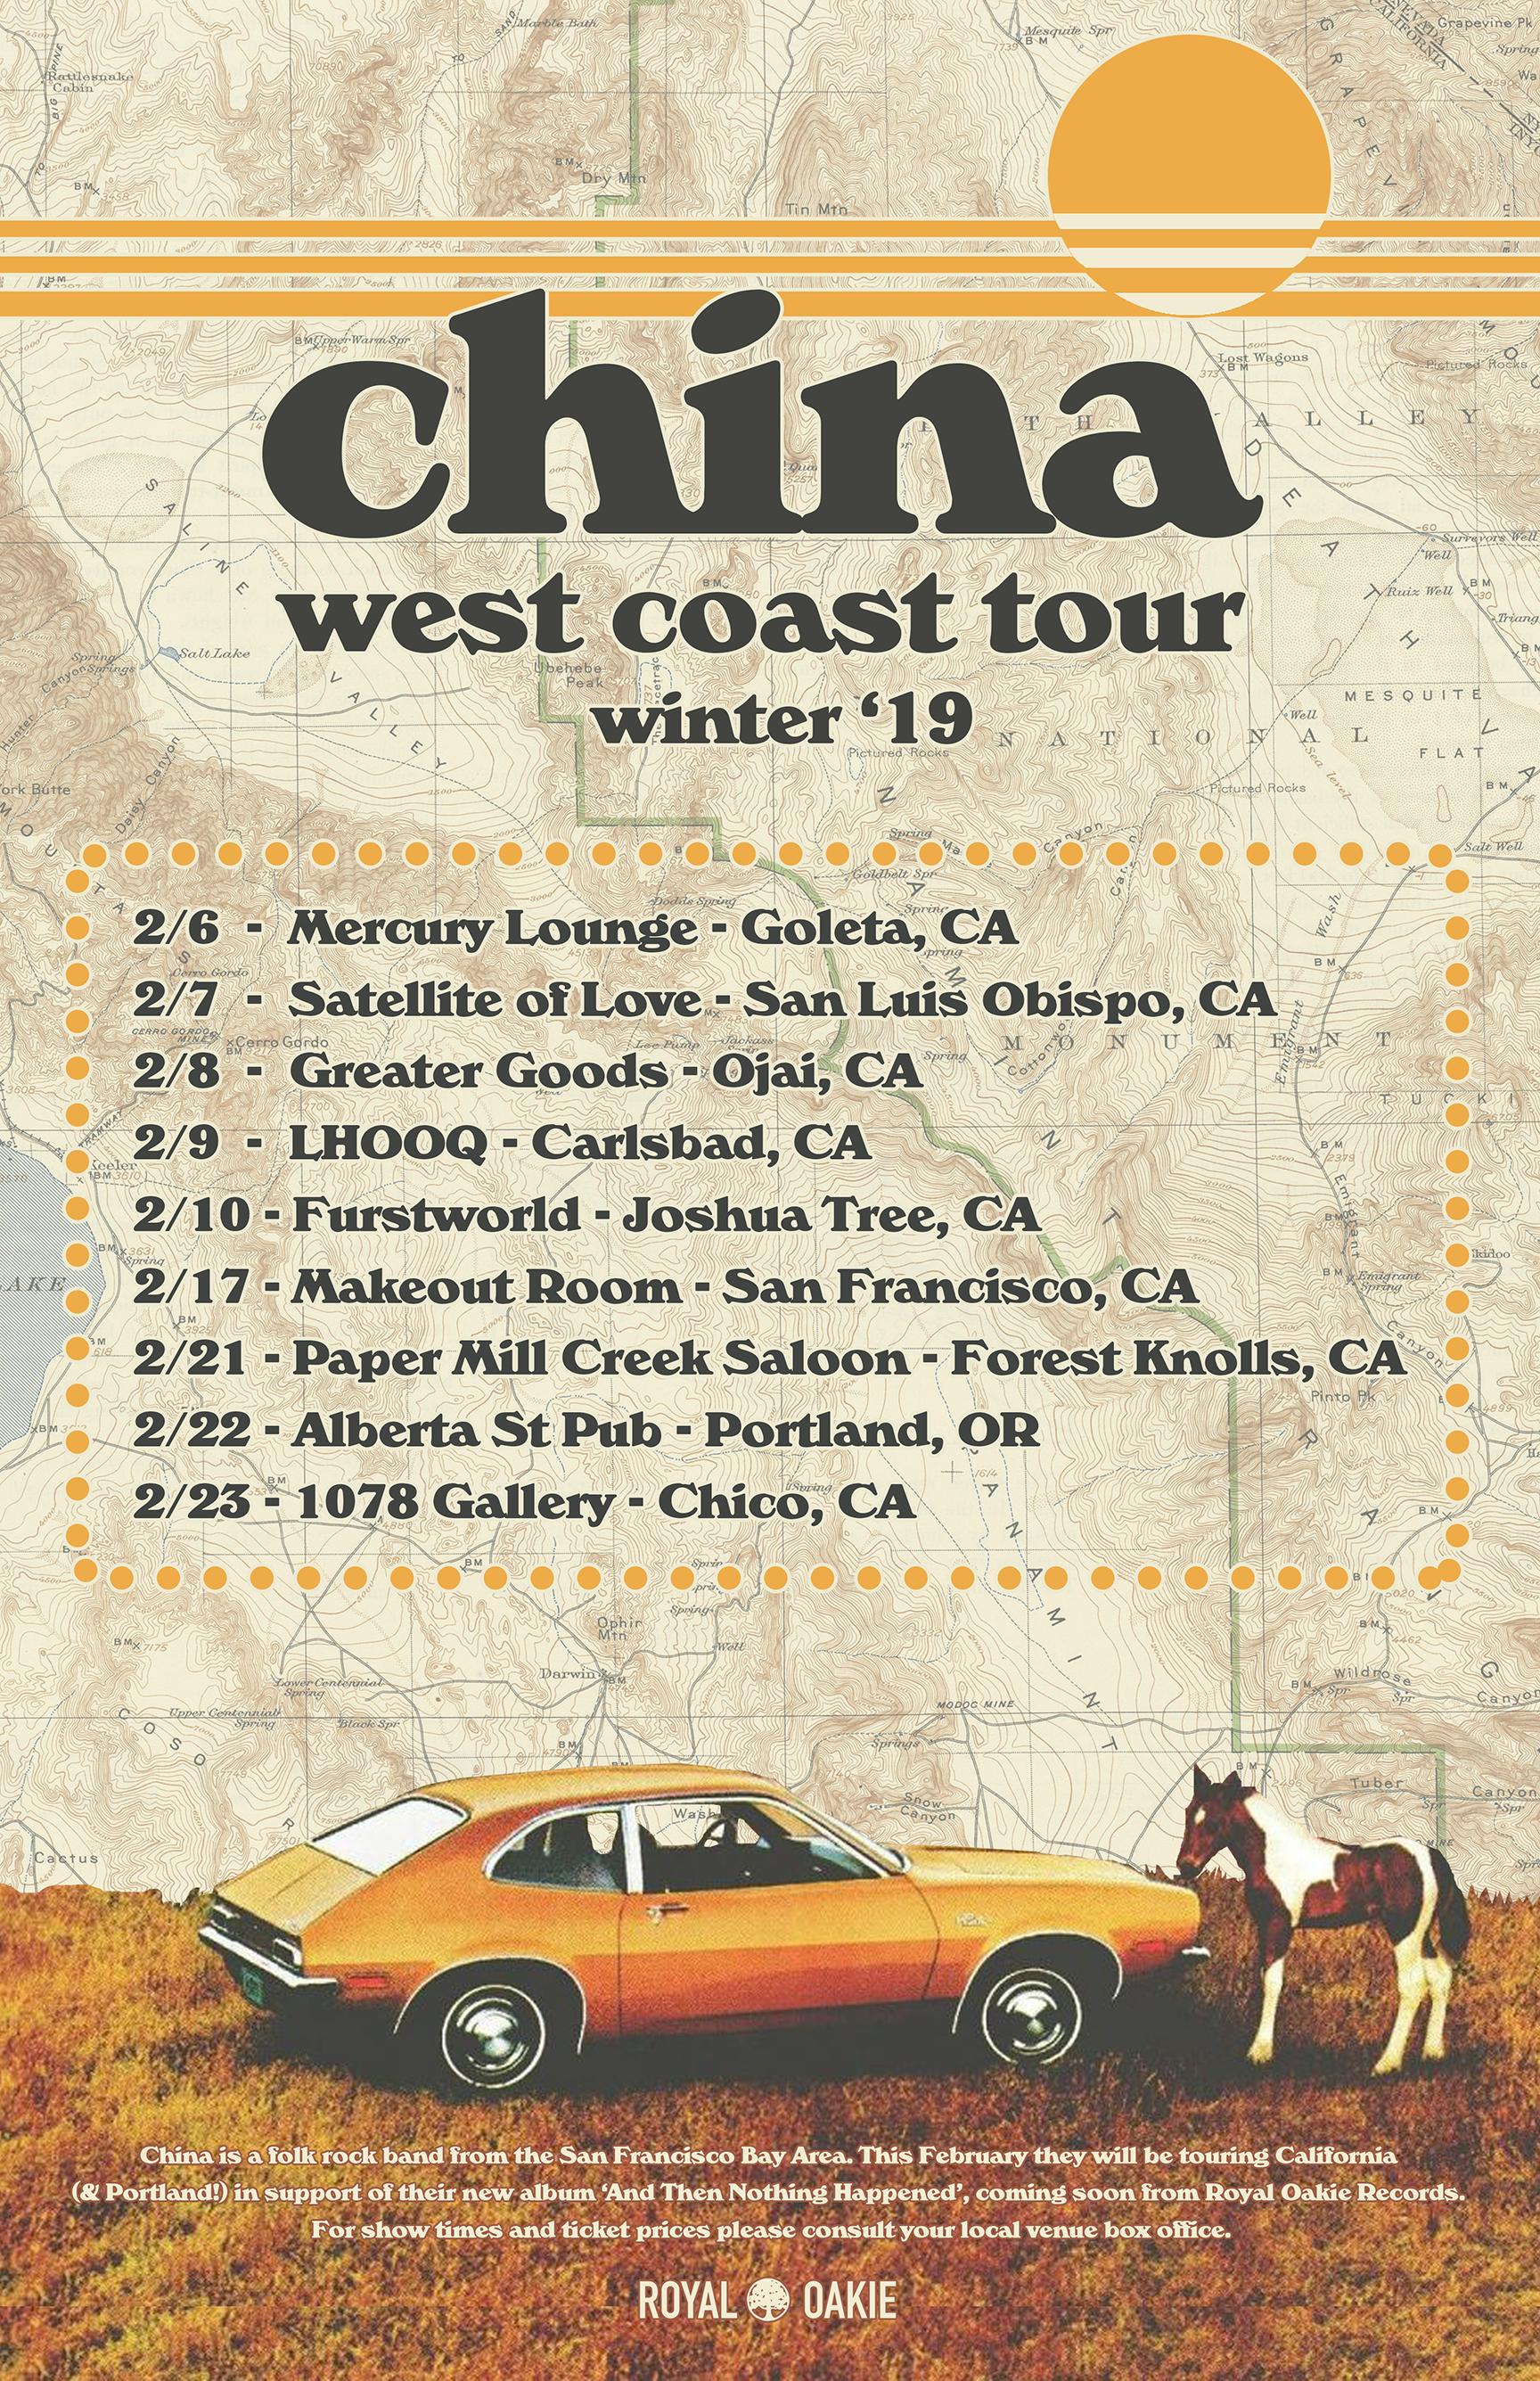 China-OleCaliforniaTour-2019-Poster-11x17-Web.png